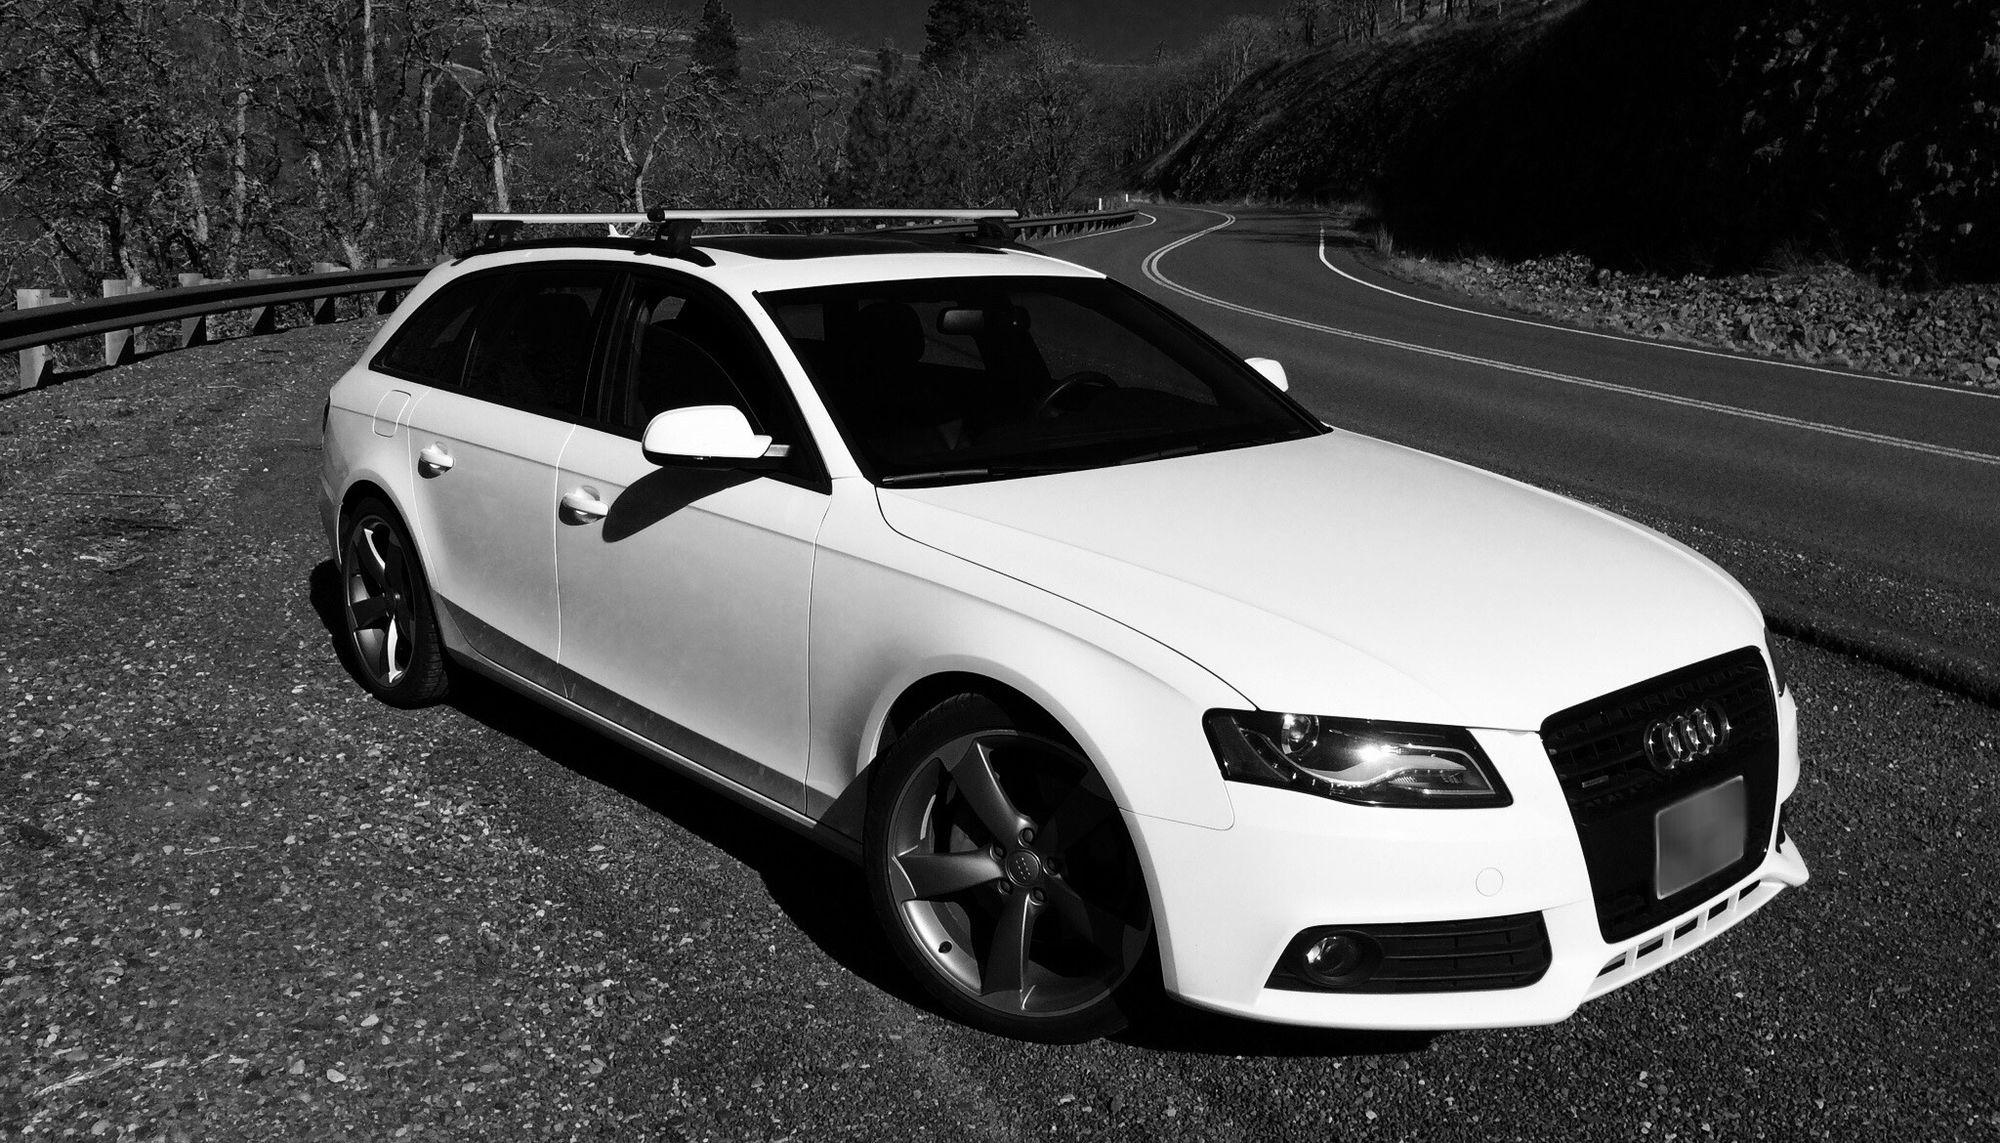 My New 2017 Audi Tts Glacier Black Optic Page 4